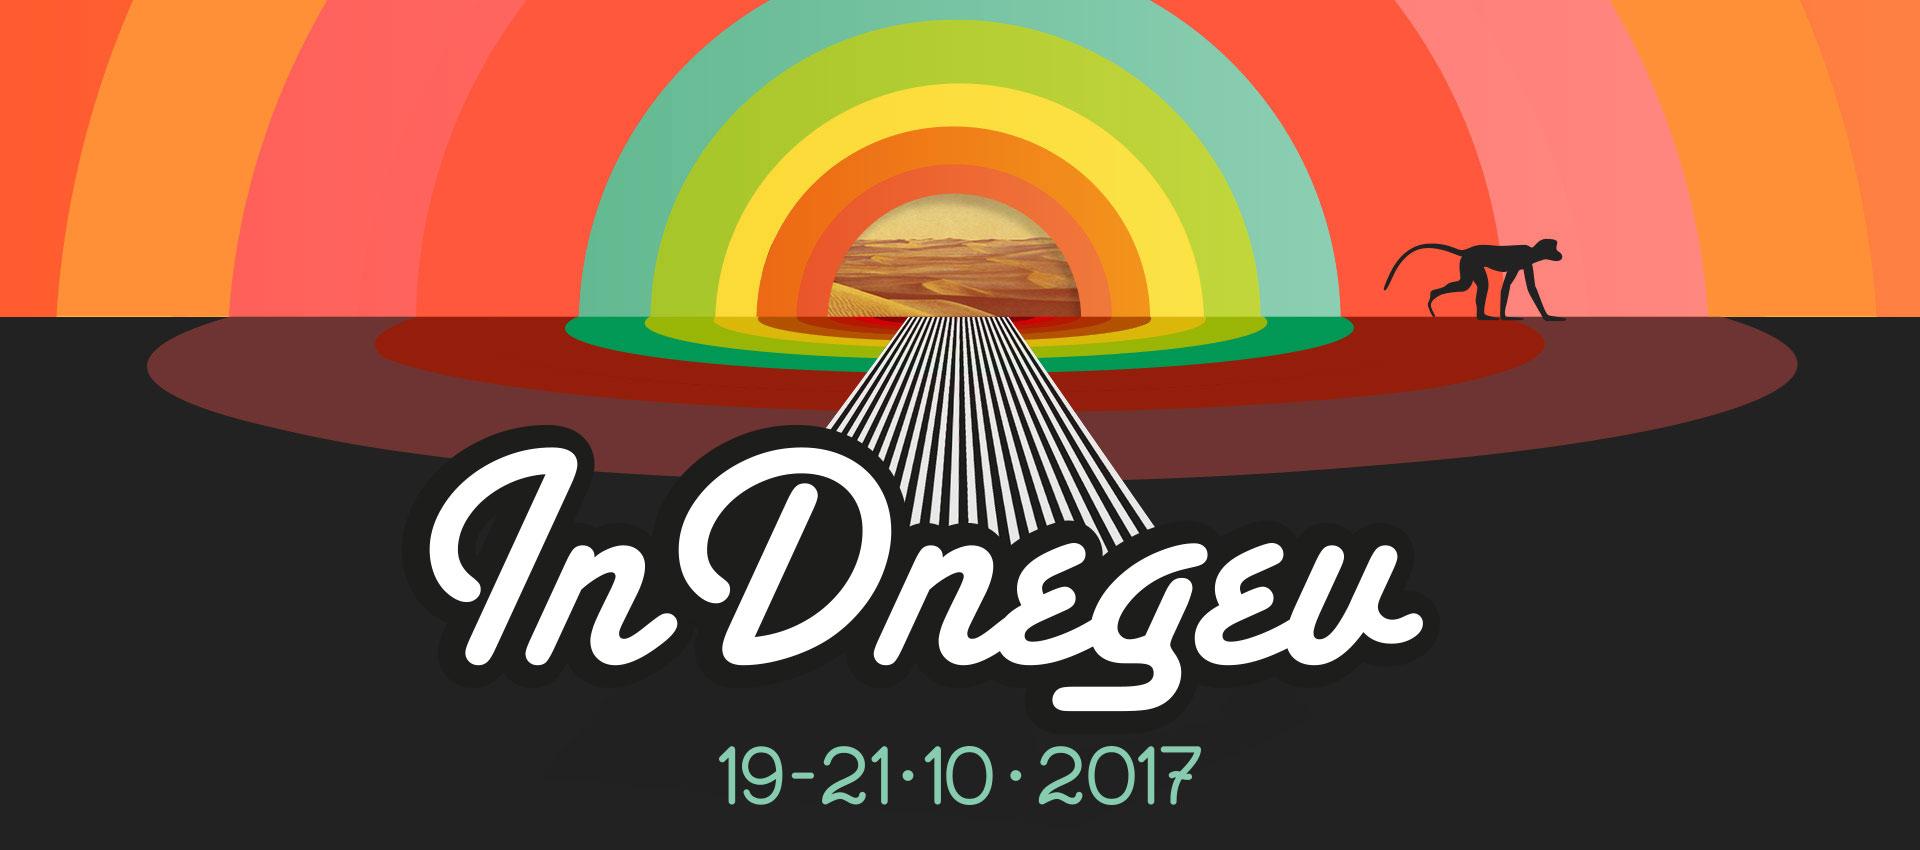 indnegev2017 wide